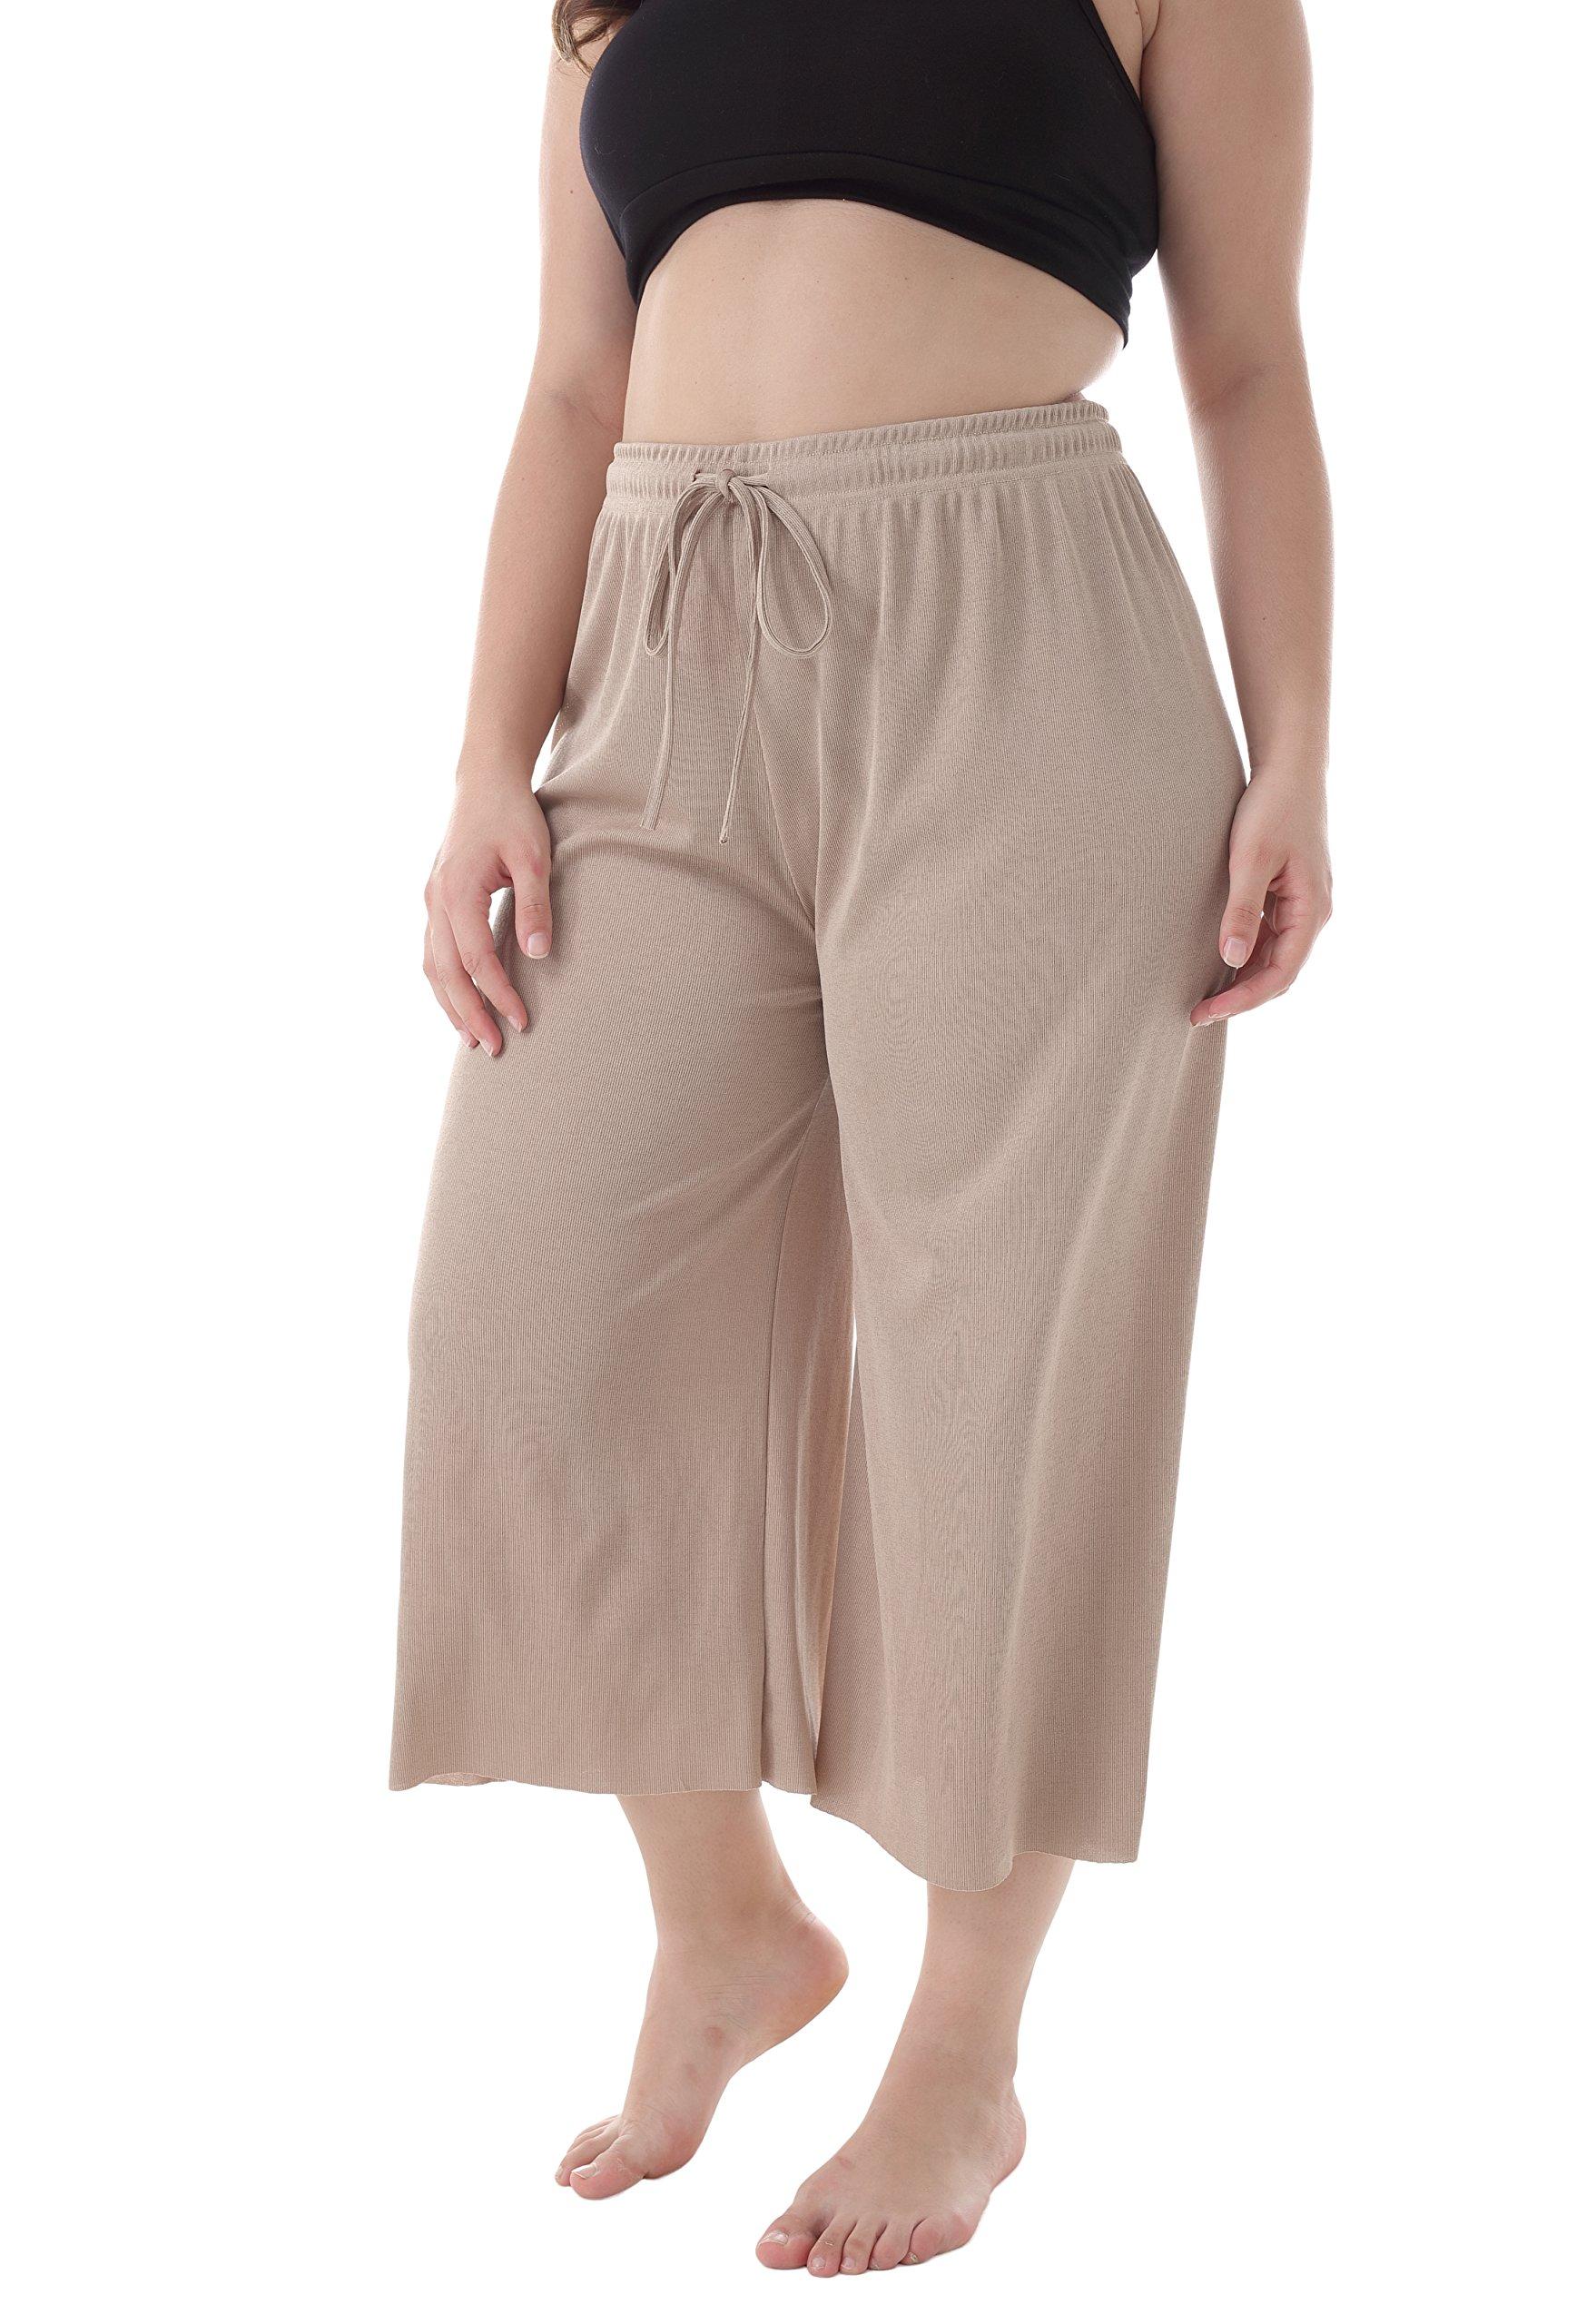 ZERDOCEAN Women's Plus Size Drawstring Wide Leg Relaxed Lounge Capris with Pockets Khaki 1X